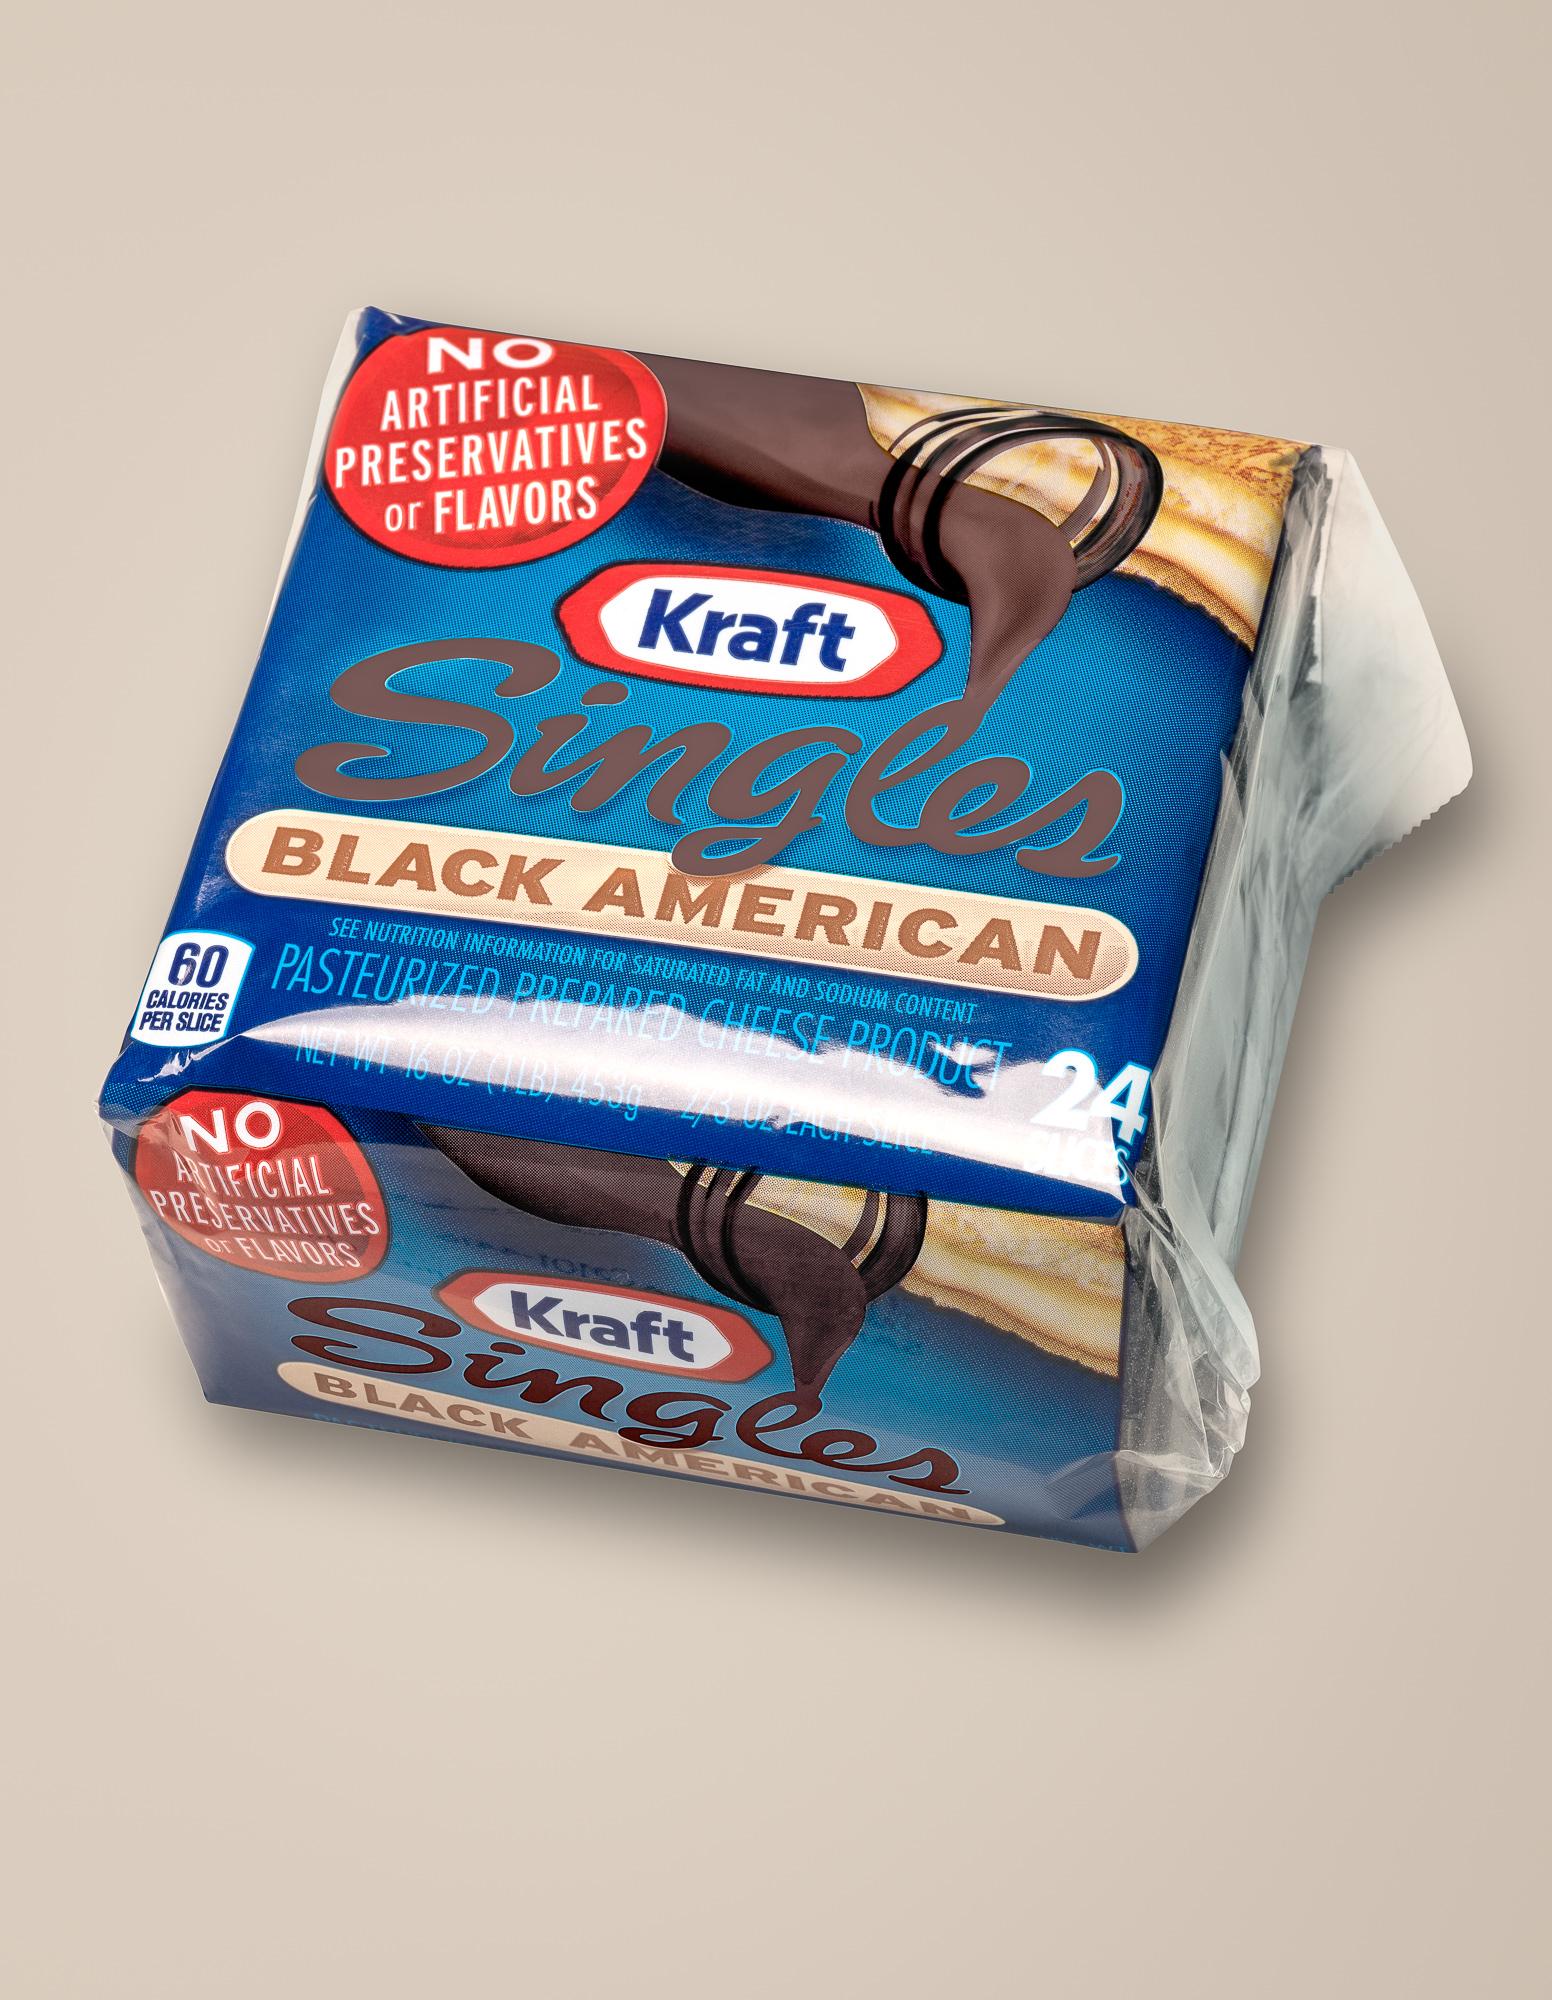 BlackAmerican_Layered.jpg